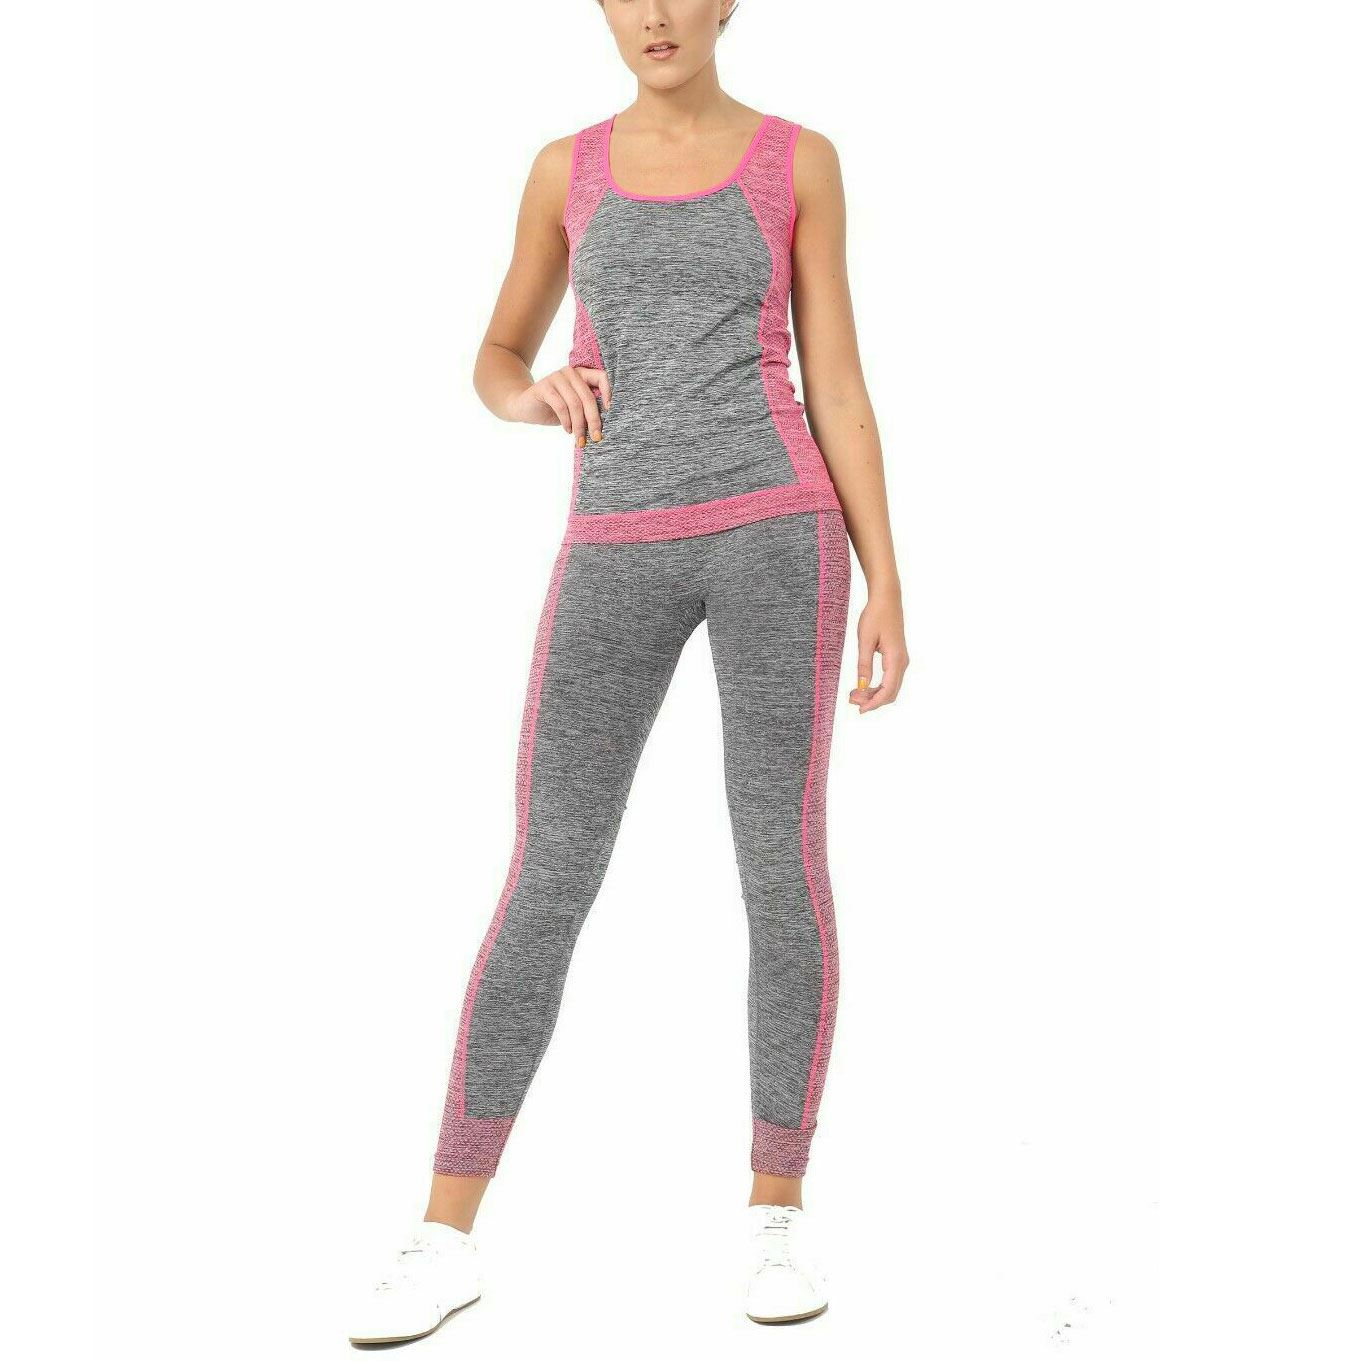 2pcs Damen Sport Yoga Anzug Weste Top Leggings Hose Outfit